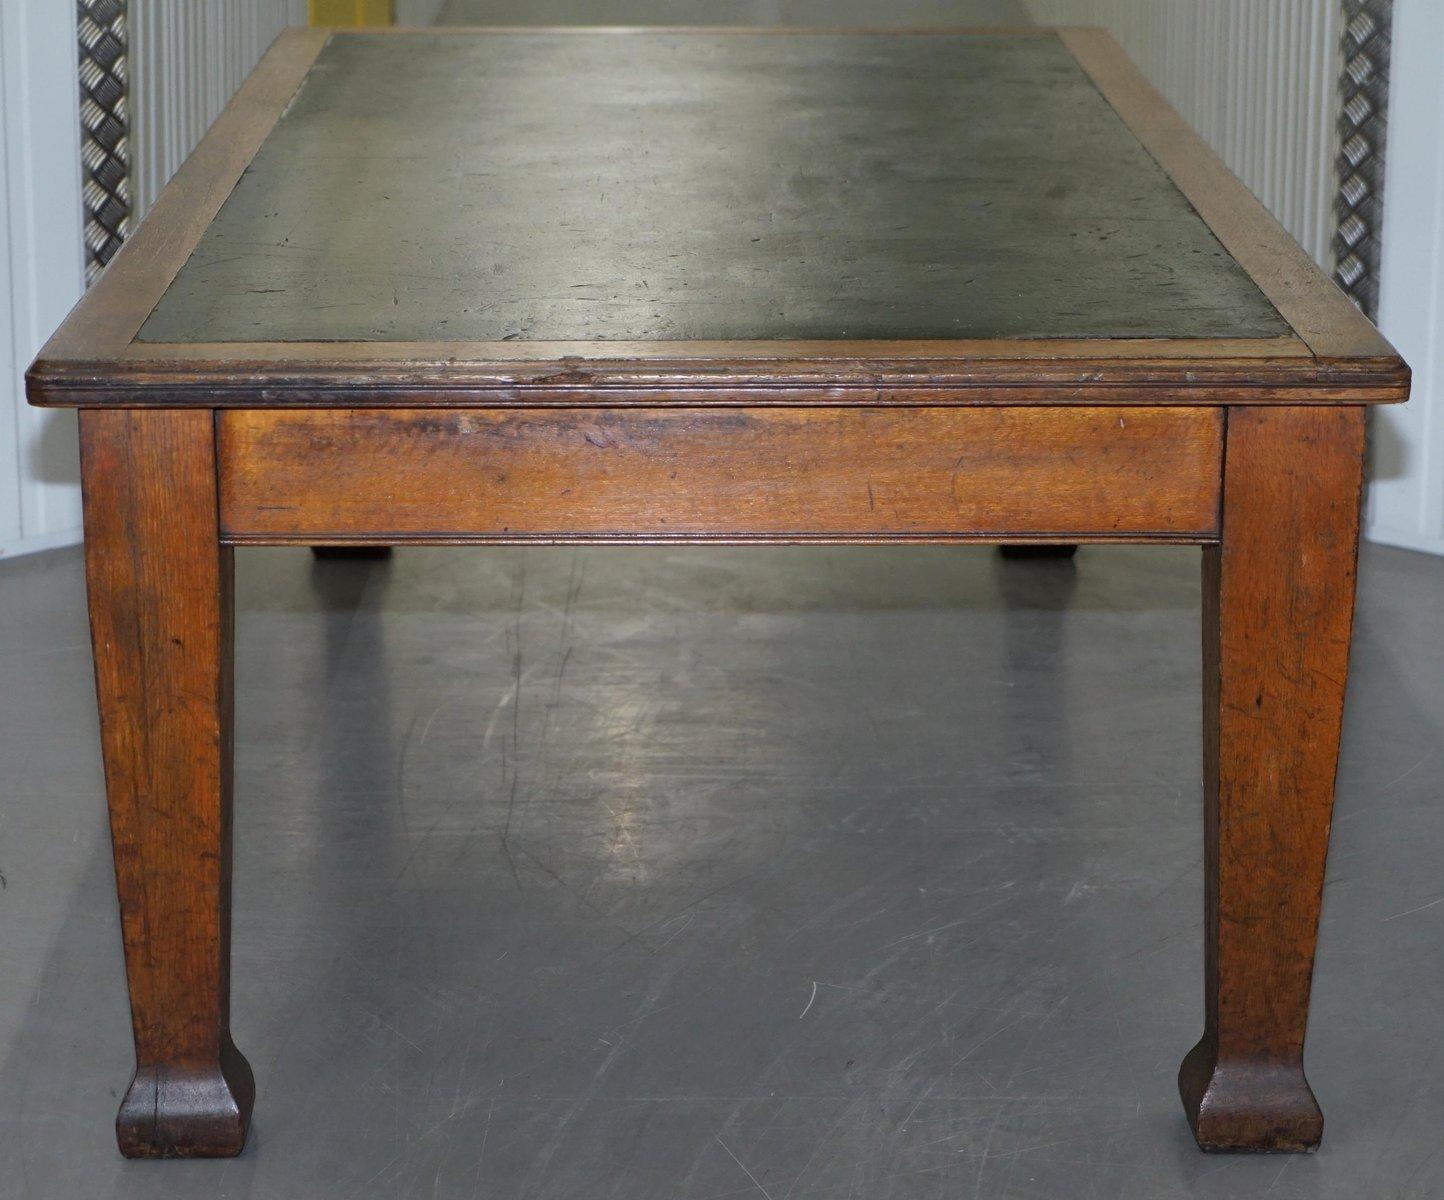 grande table de salle manger en ch ne massif 1900s en vente sur pamono. Black Bedroom Furniture Sets. Home Design Ideas